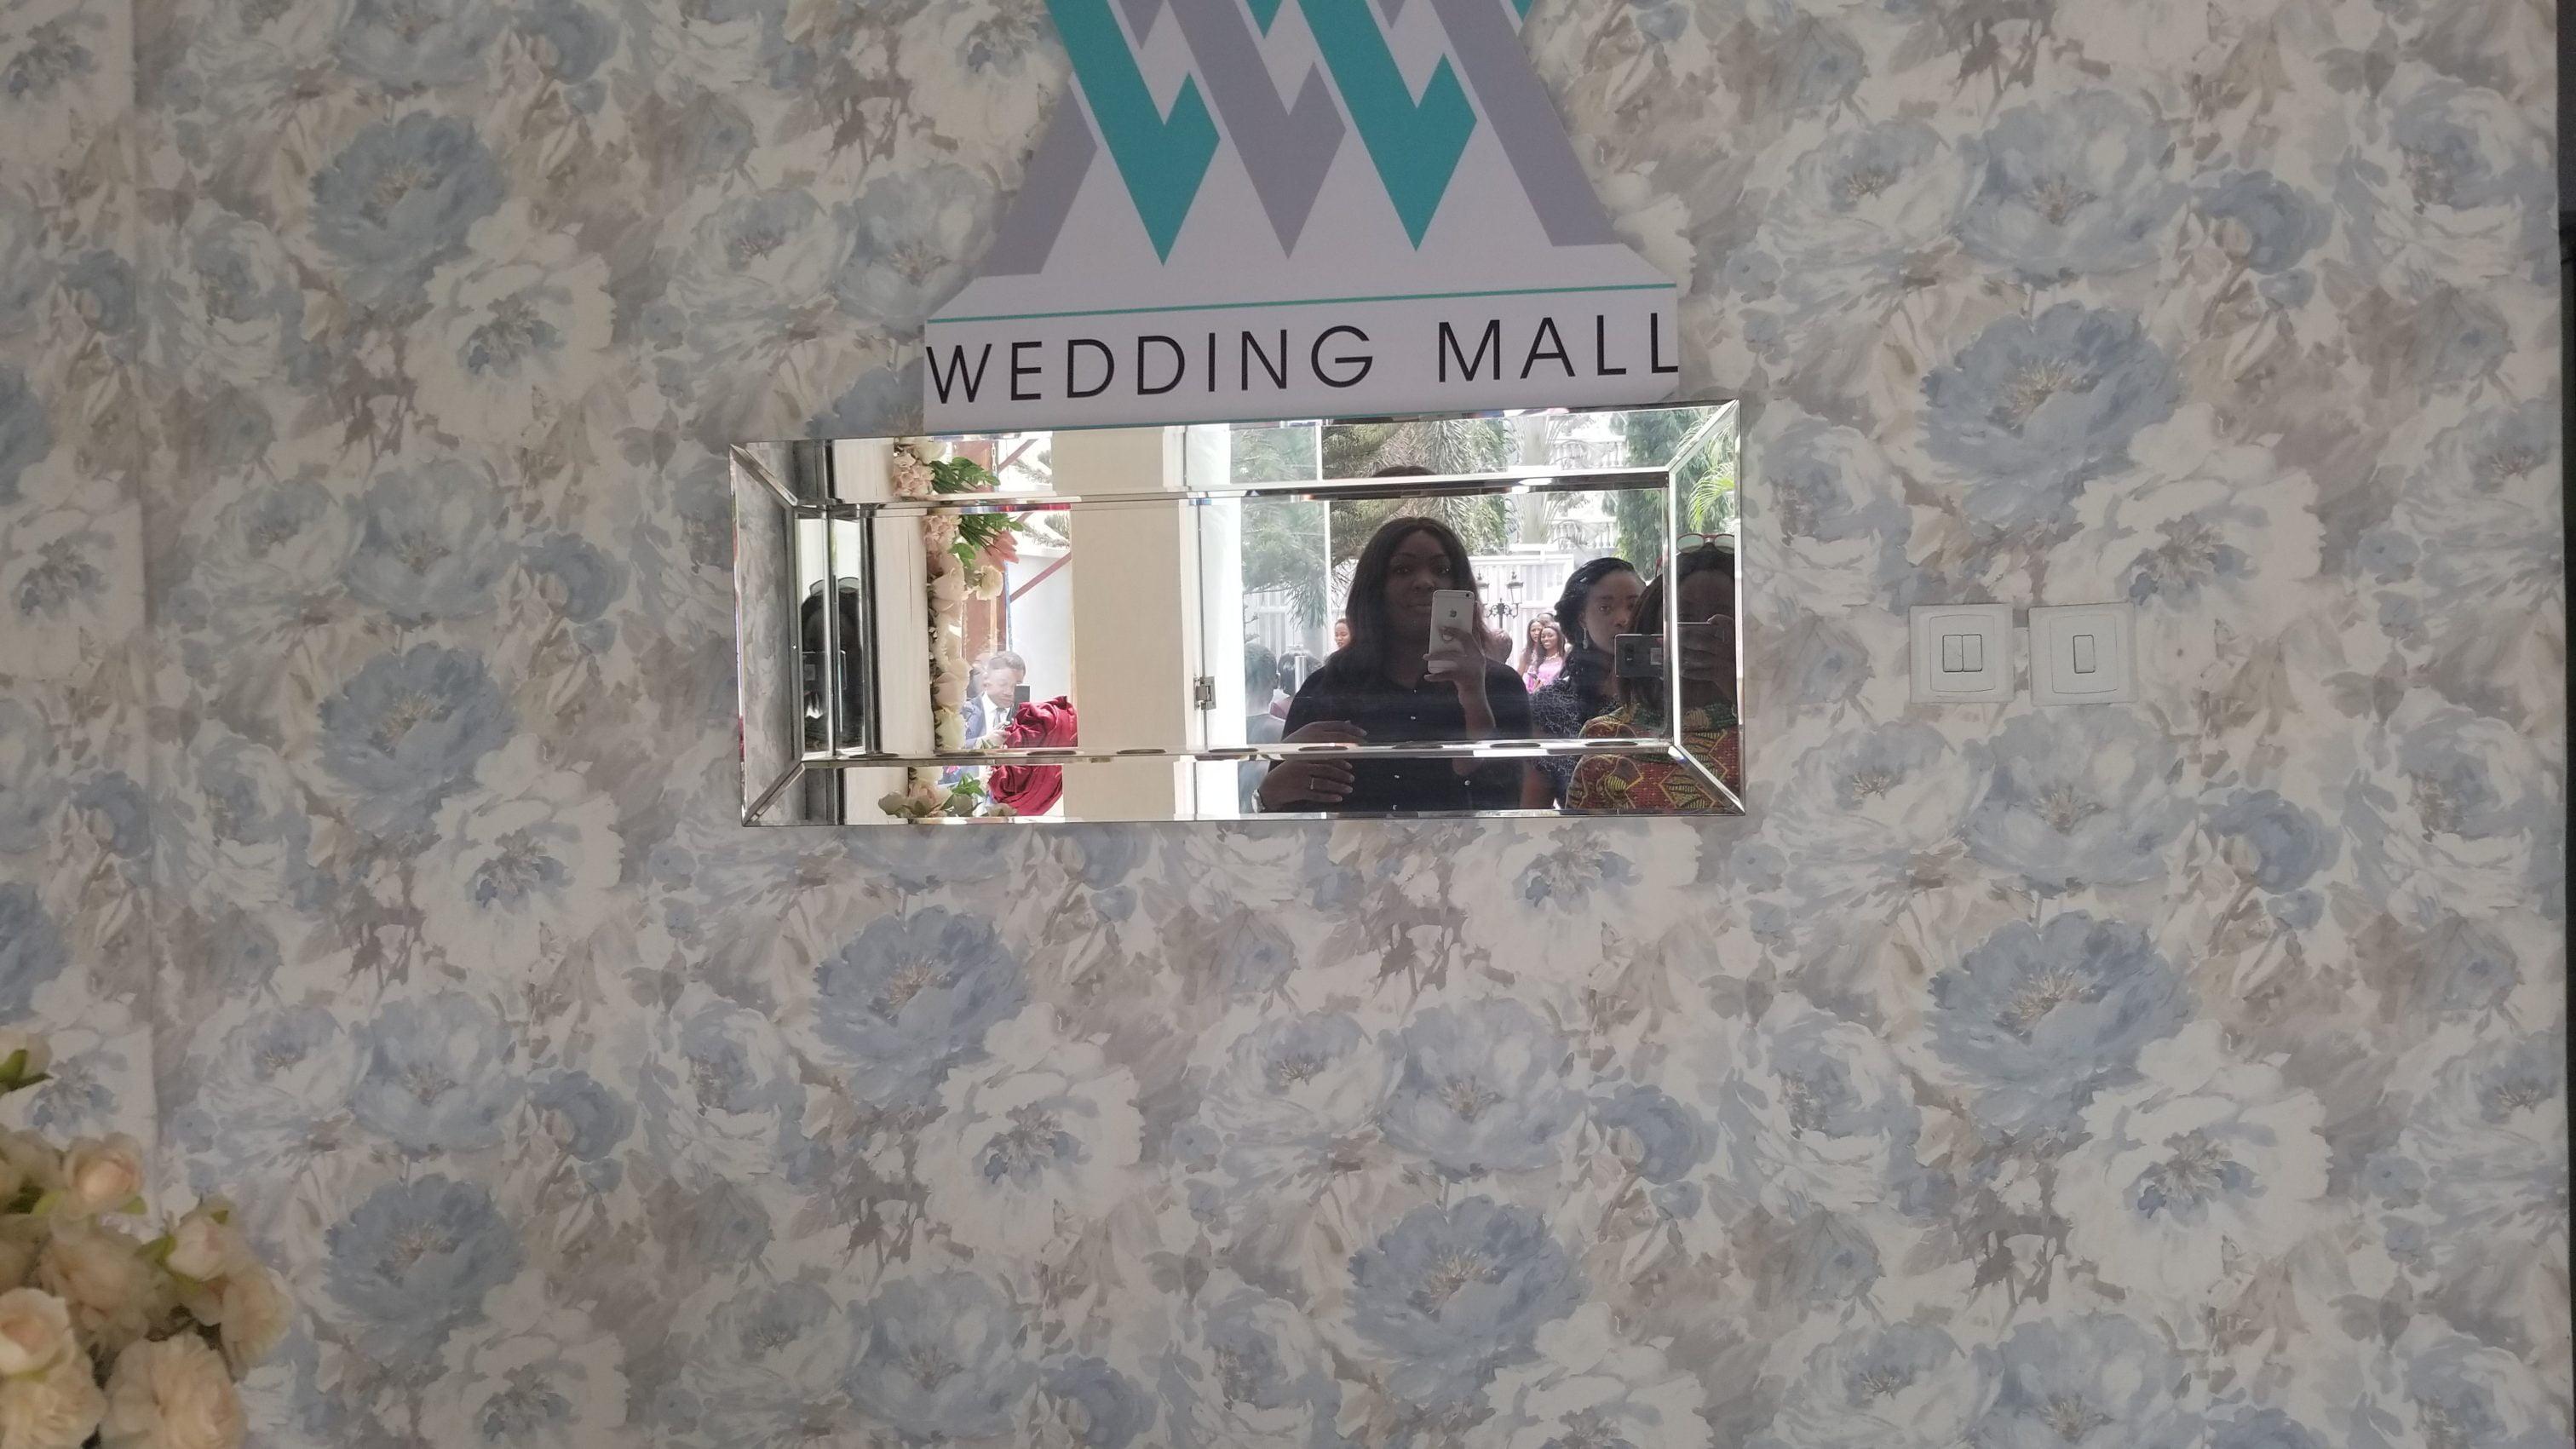 Wedding Mall, Lekki